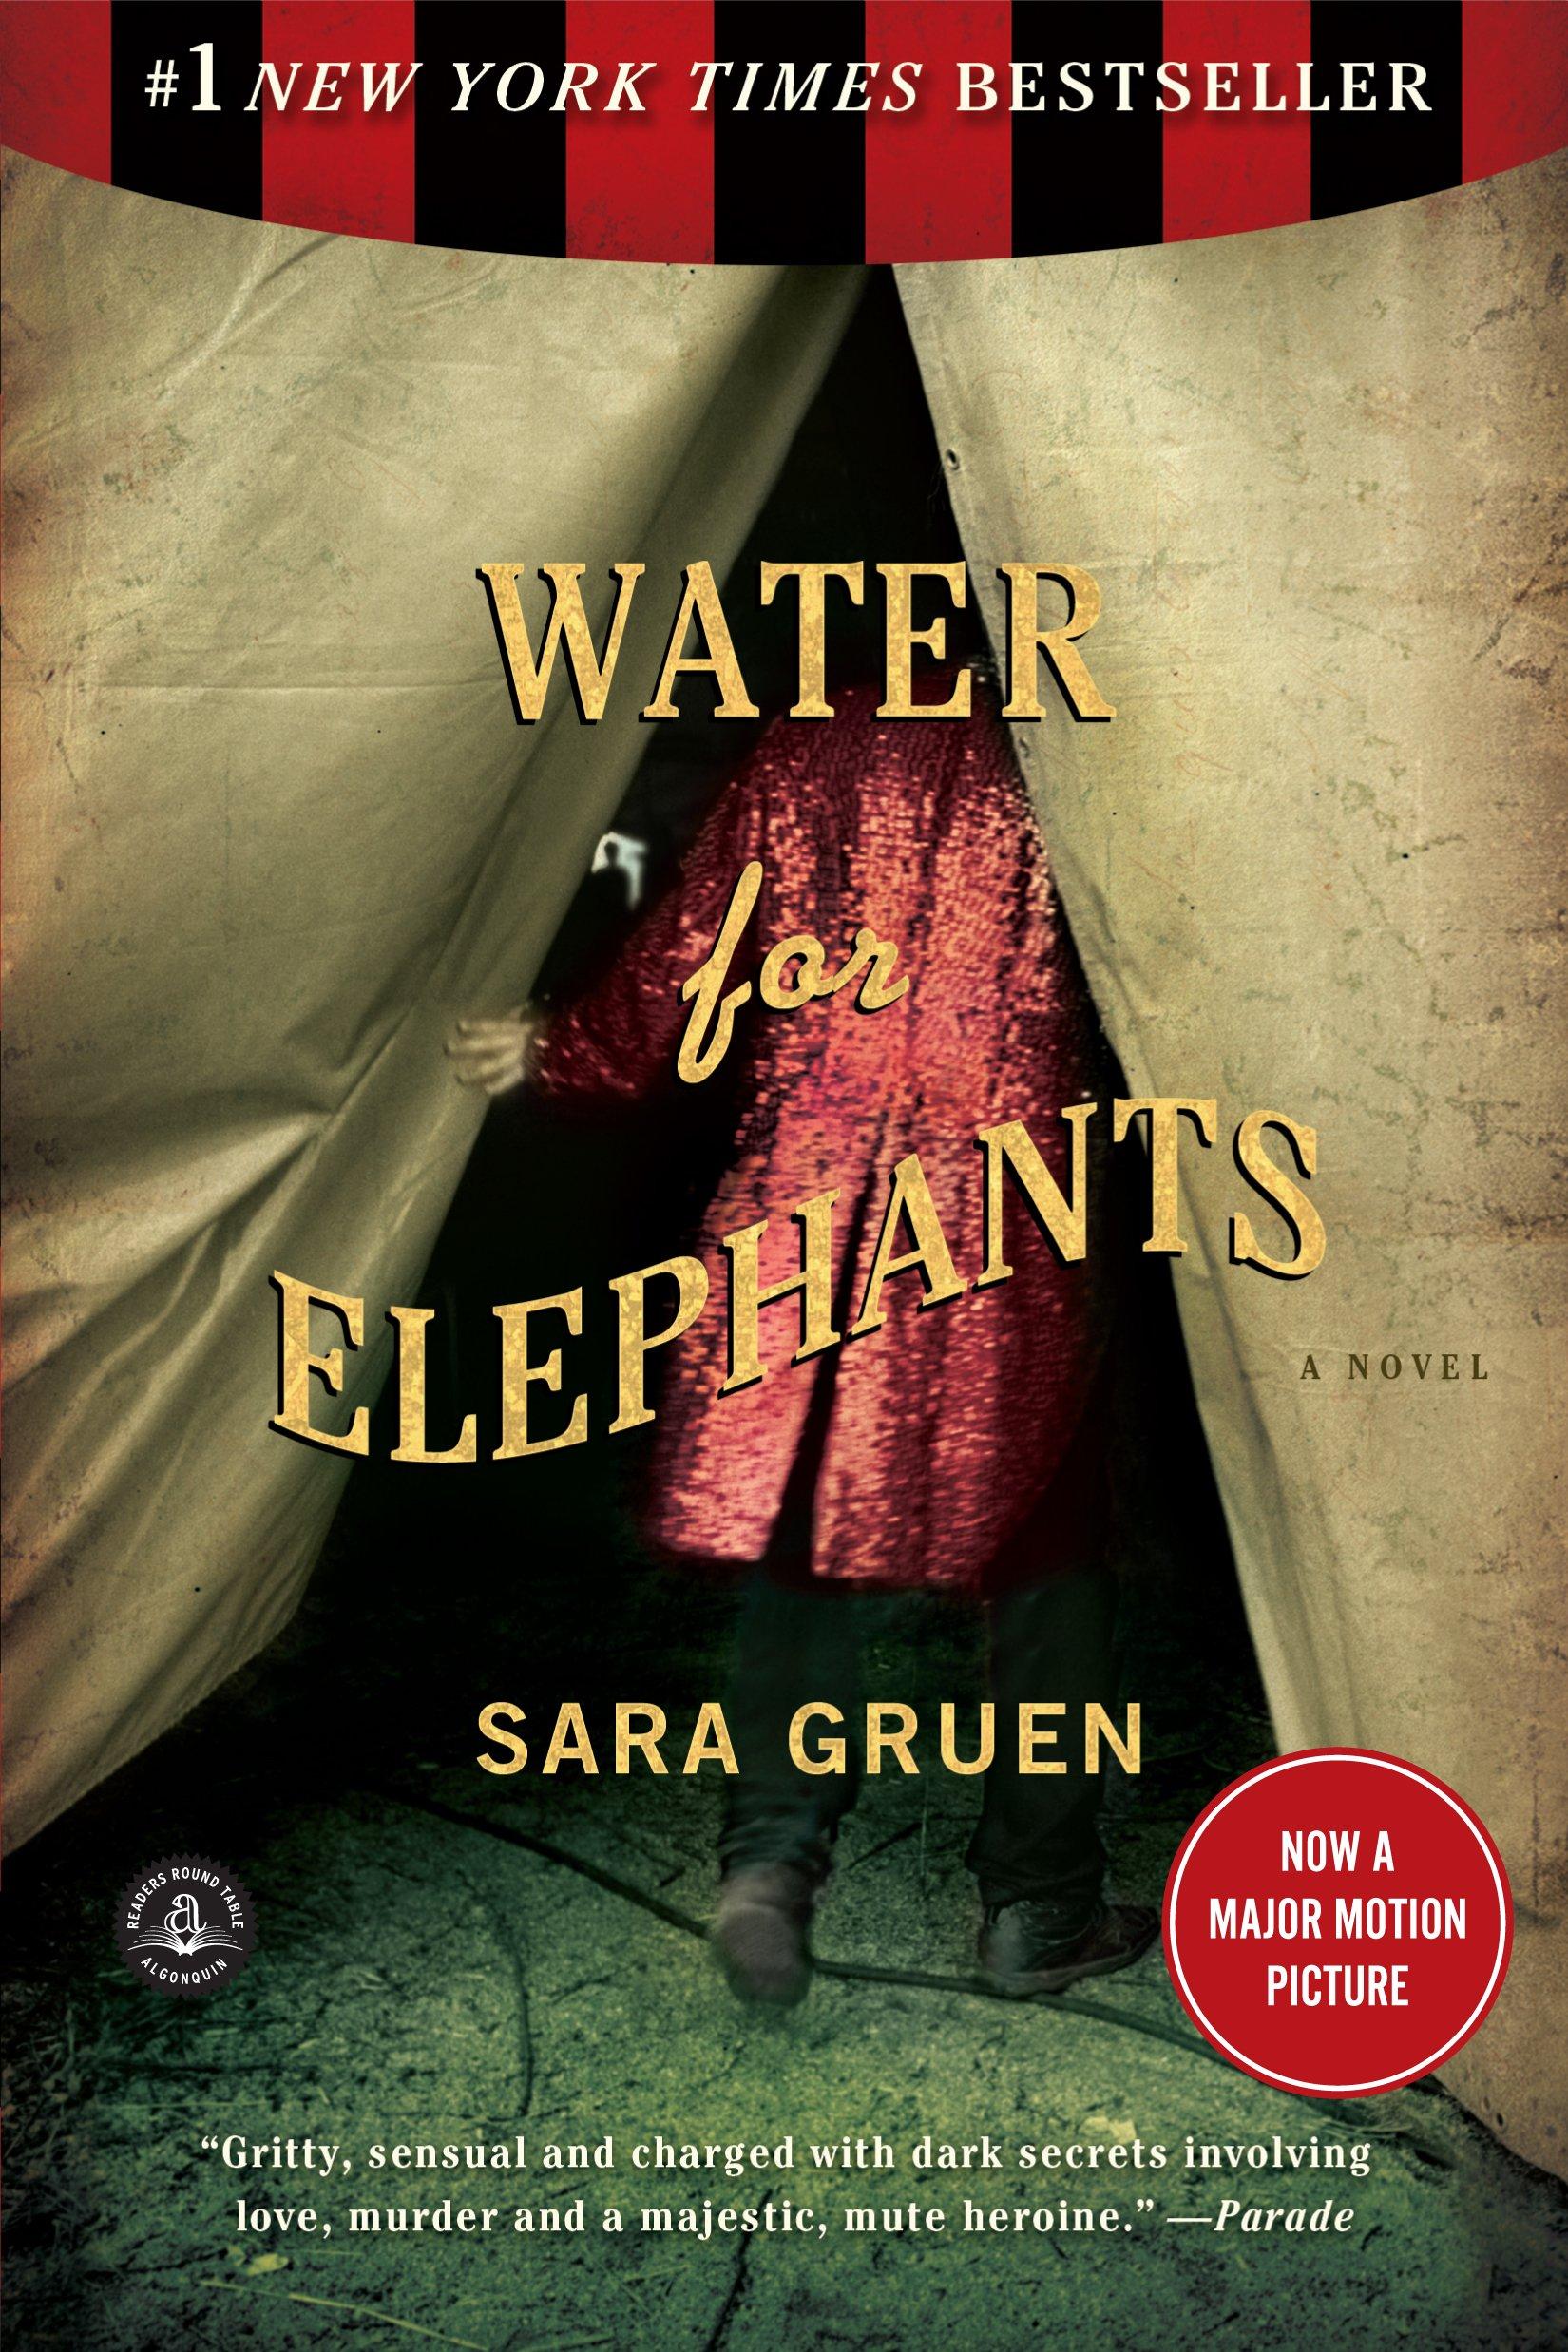 Water For Elephants: A Novel: Sara Gruen: 9781565125605: Amazon: Books